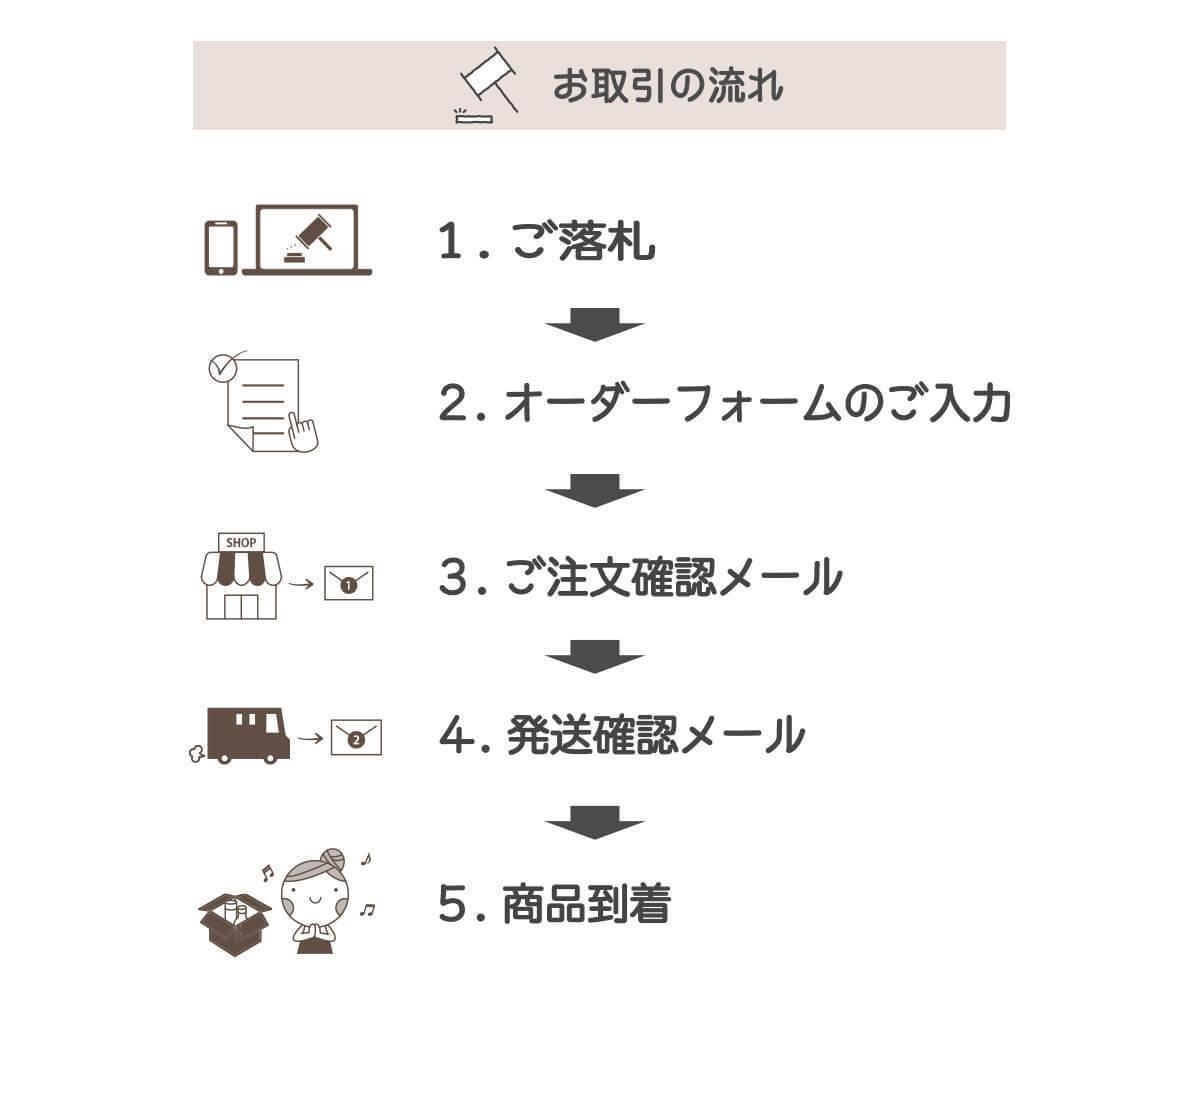 ▼ wonder 麹まるごと贅沢青汁 30袋入 賞味期限2022年4月9日迄 未開封品 ネコポス可_画像4